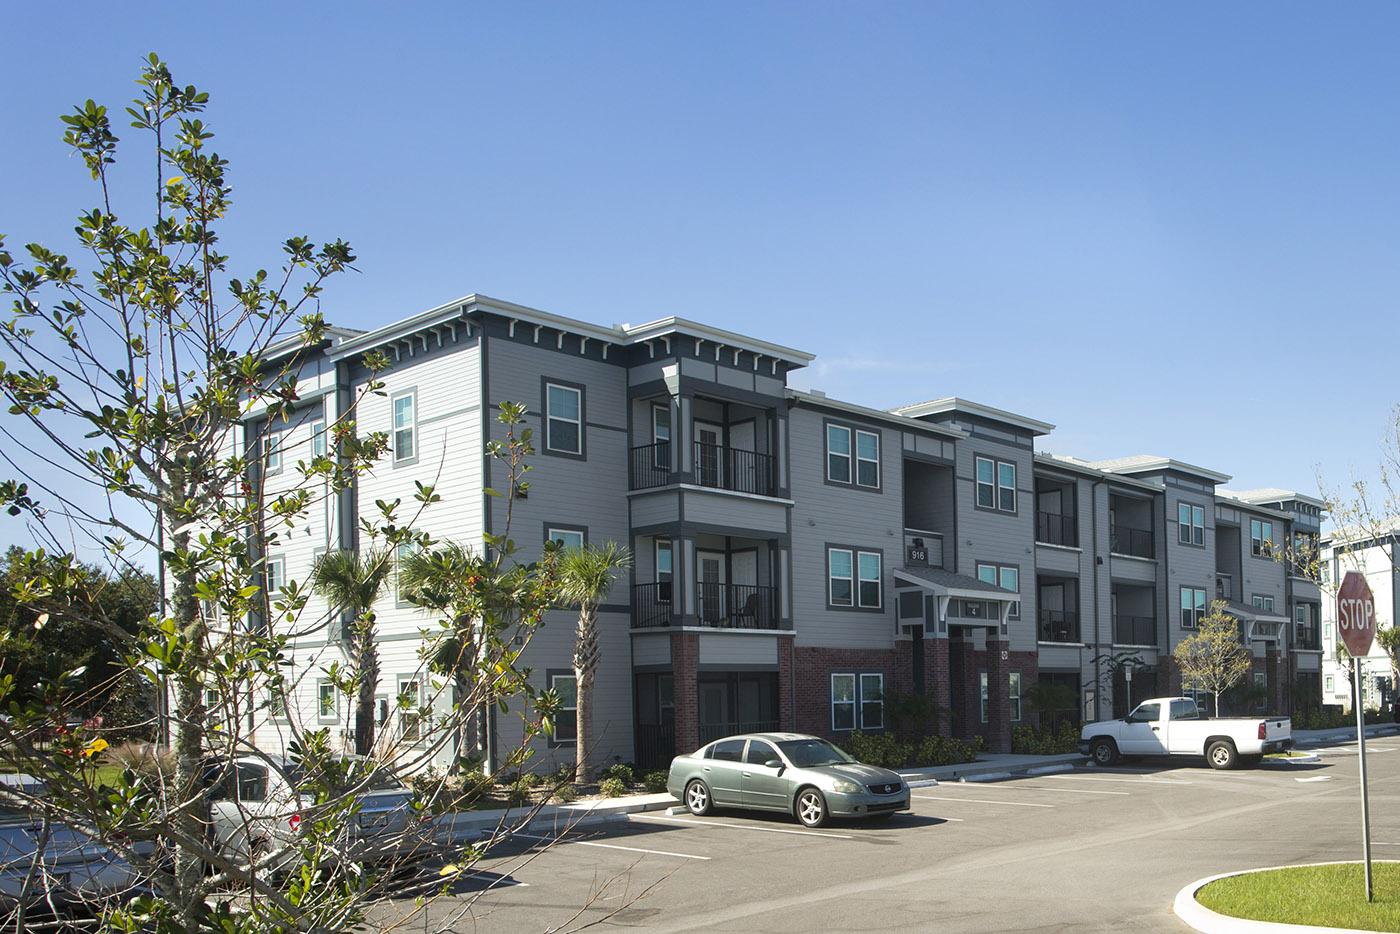 CharlestonEdge-Rental-Apartment-Brandon-Tampa-Florida-Pool-Bedrooms-Exterior-1.jpg